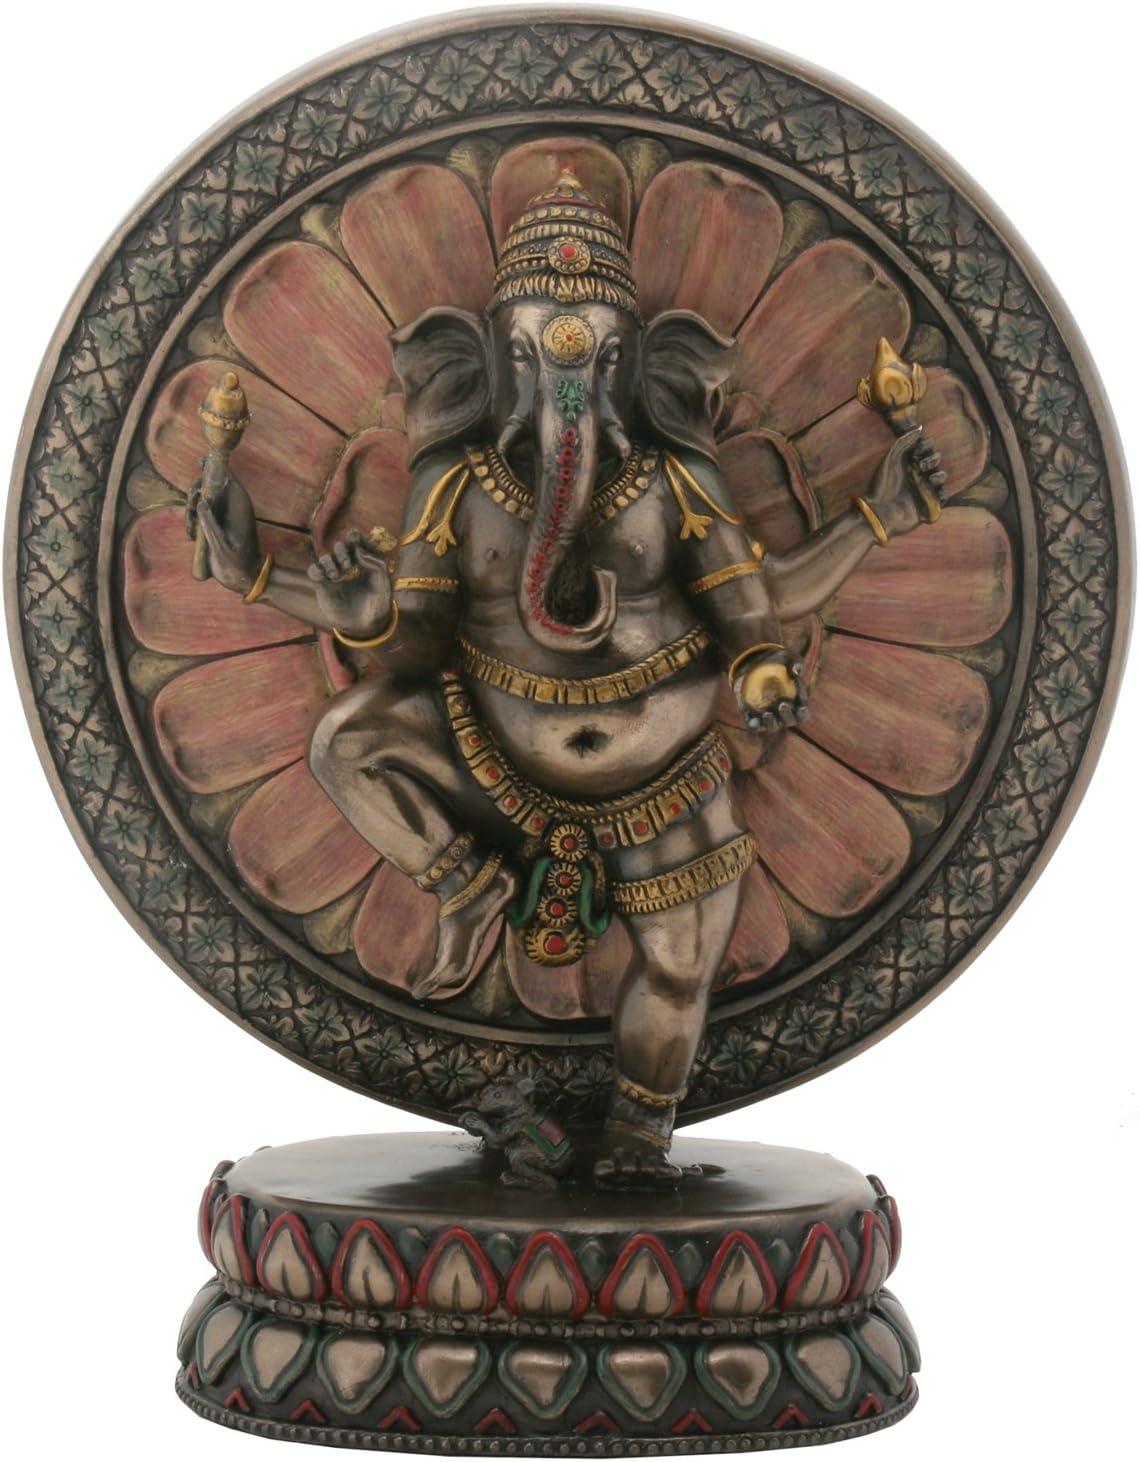 9 Inch Cold Cast Resin Hindu Deity Ganesha with Lotus Statue